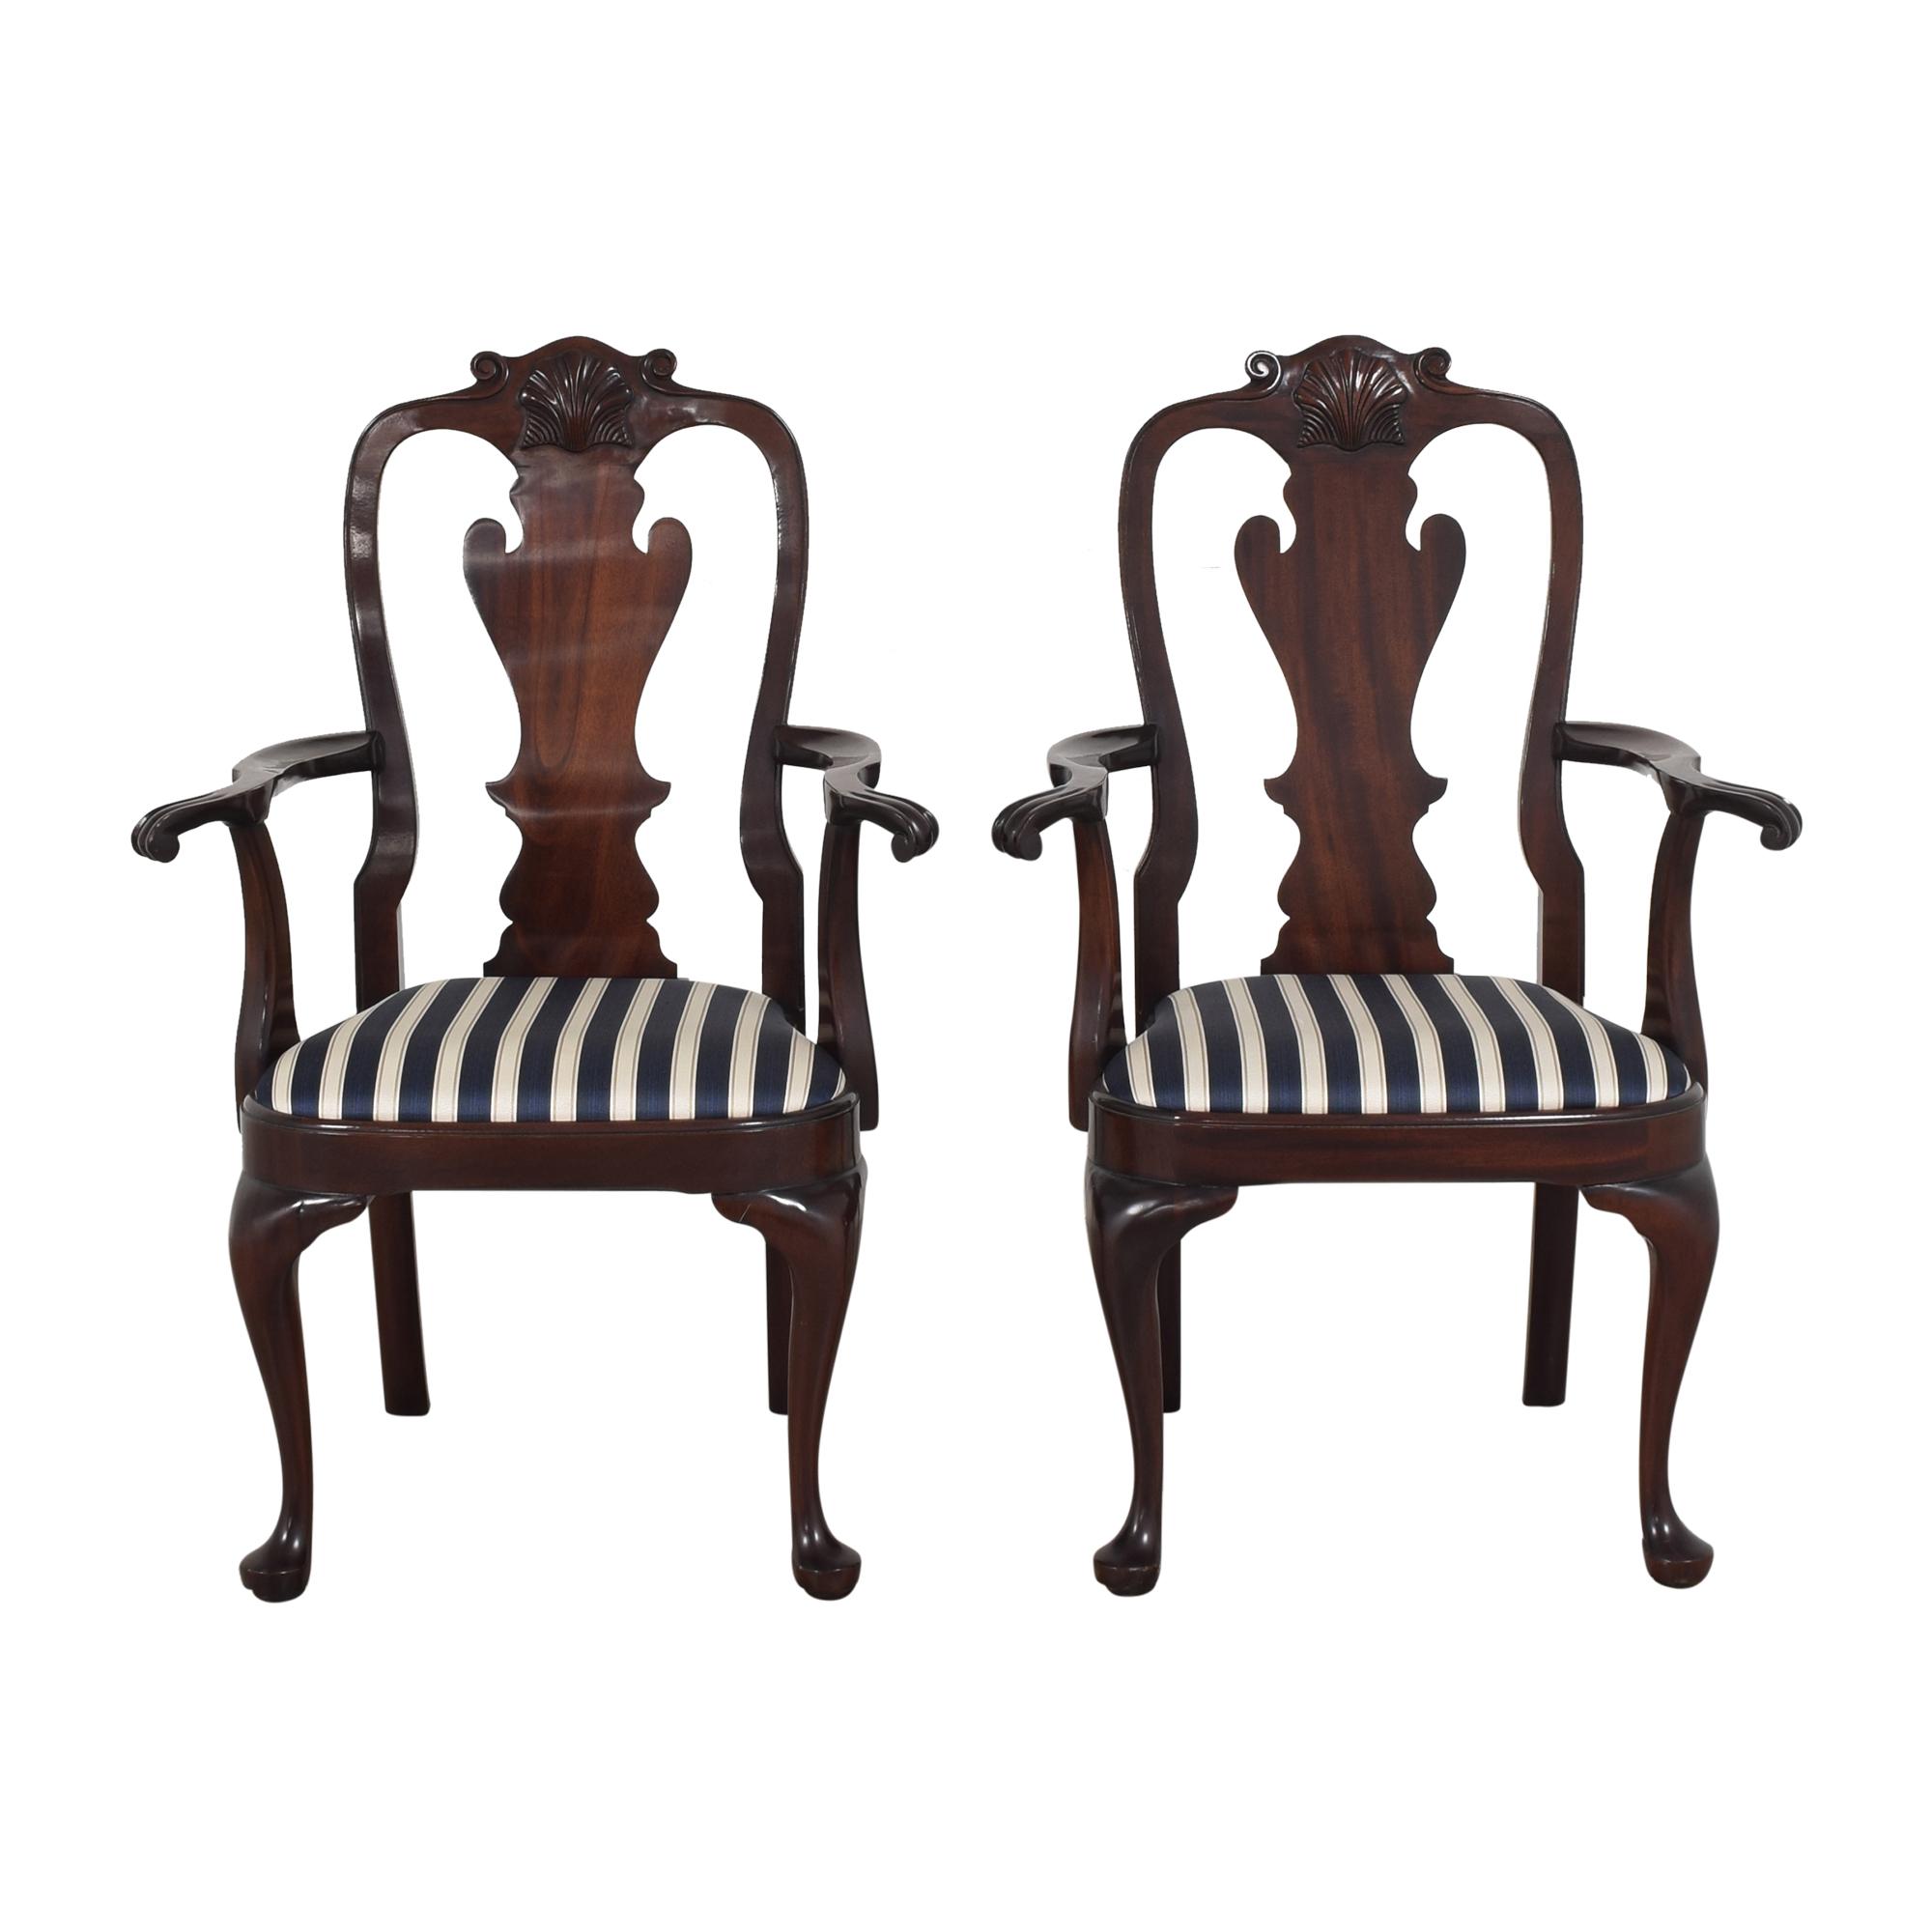 Stickley Furniture Queen Anne-Style Arm Chairs Stickley Furniture